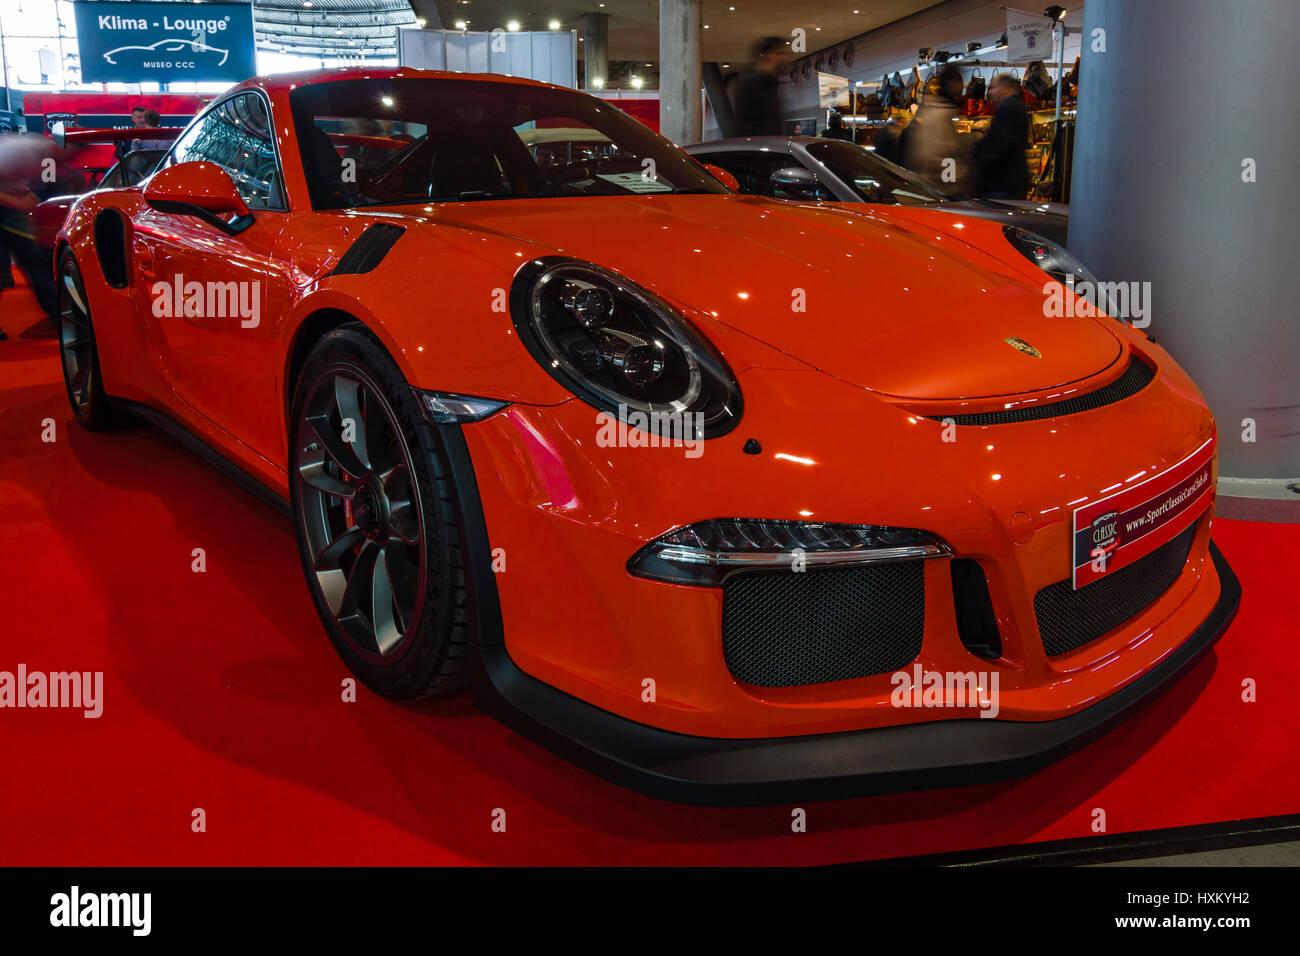 Porsche Gt3 Rs Stock Photos Amp Porsche Gt3 Rs Stock Images